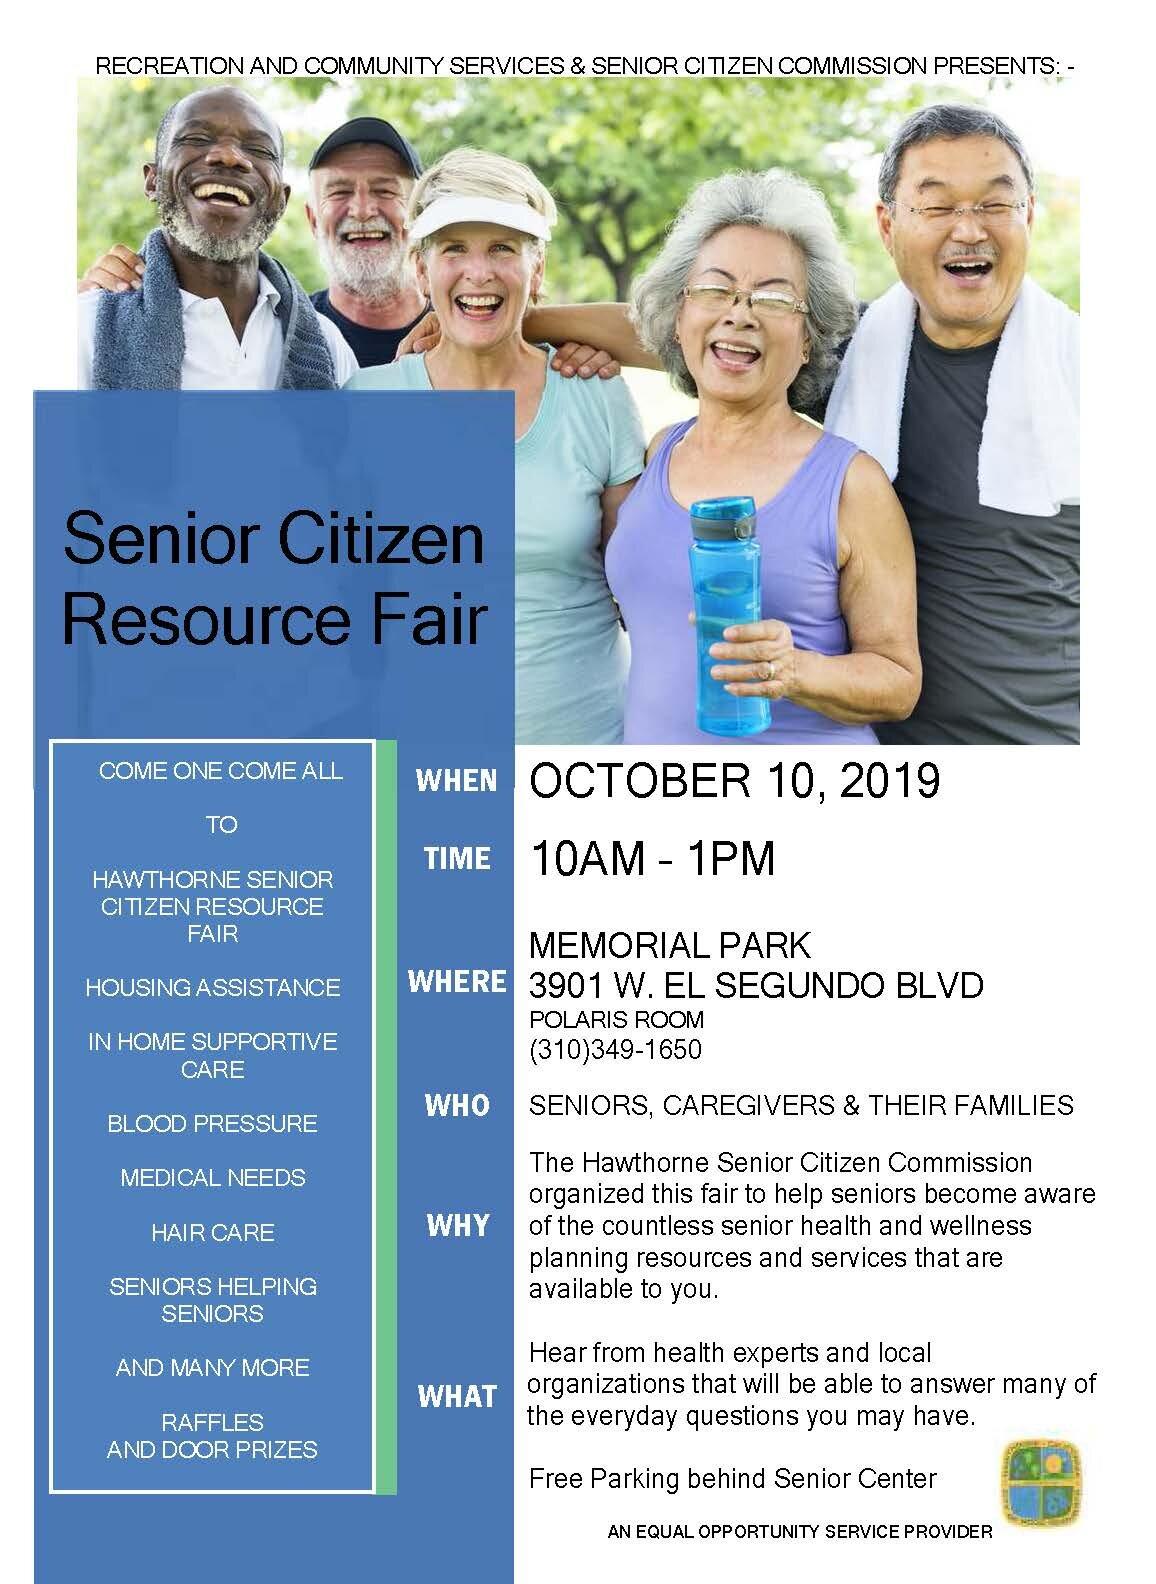 Senior Citizen Resource Fair